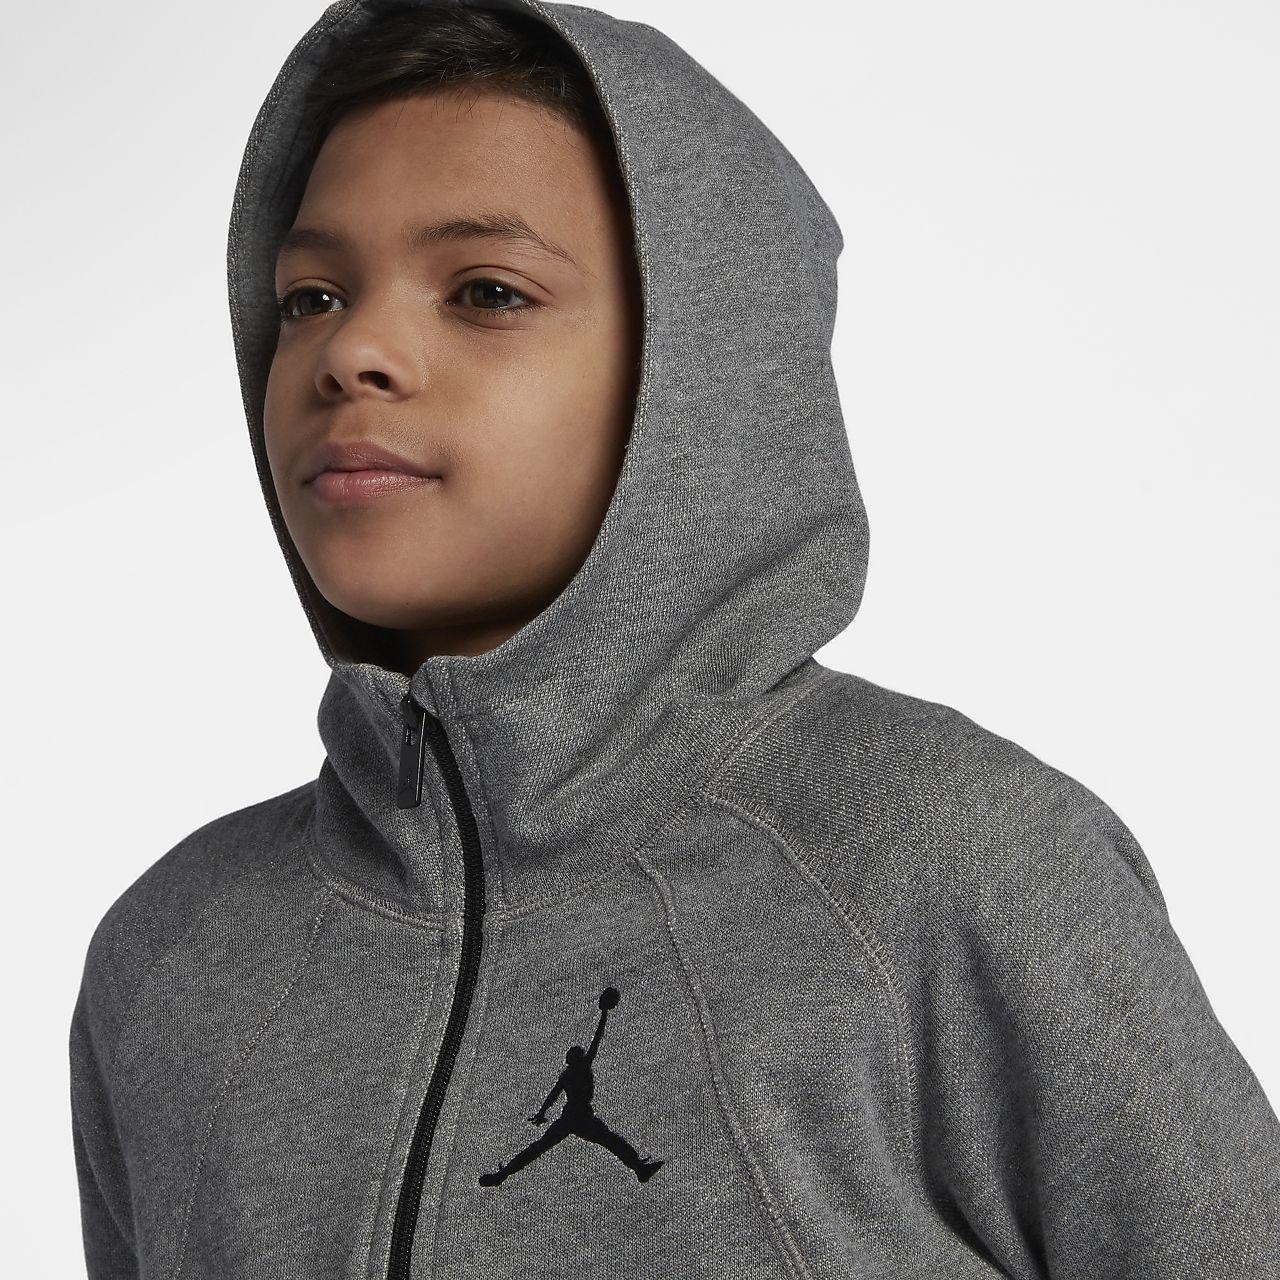 1e64fd1cf419 Jordan Sportswear Wings Lite Older Kids  (Boys ) Full-Zip Hoodie ...